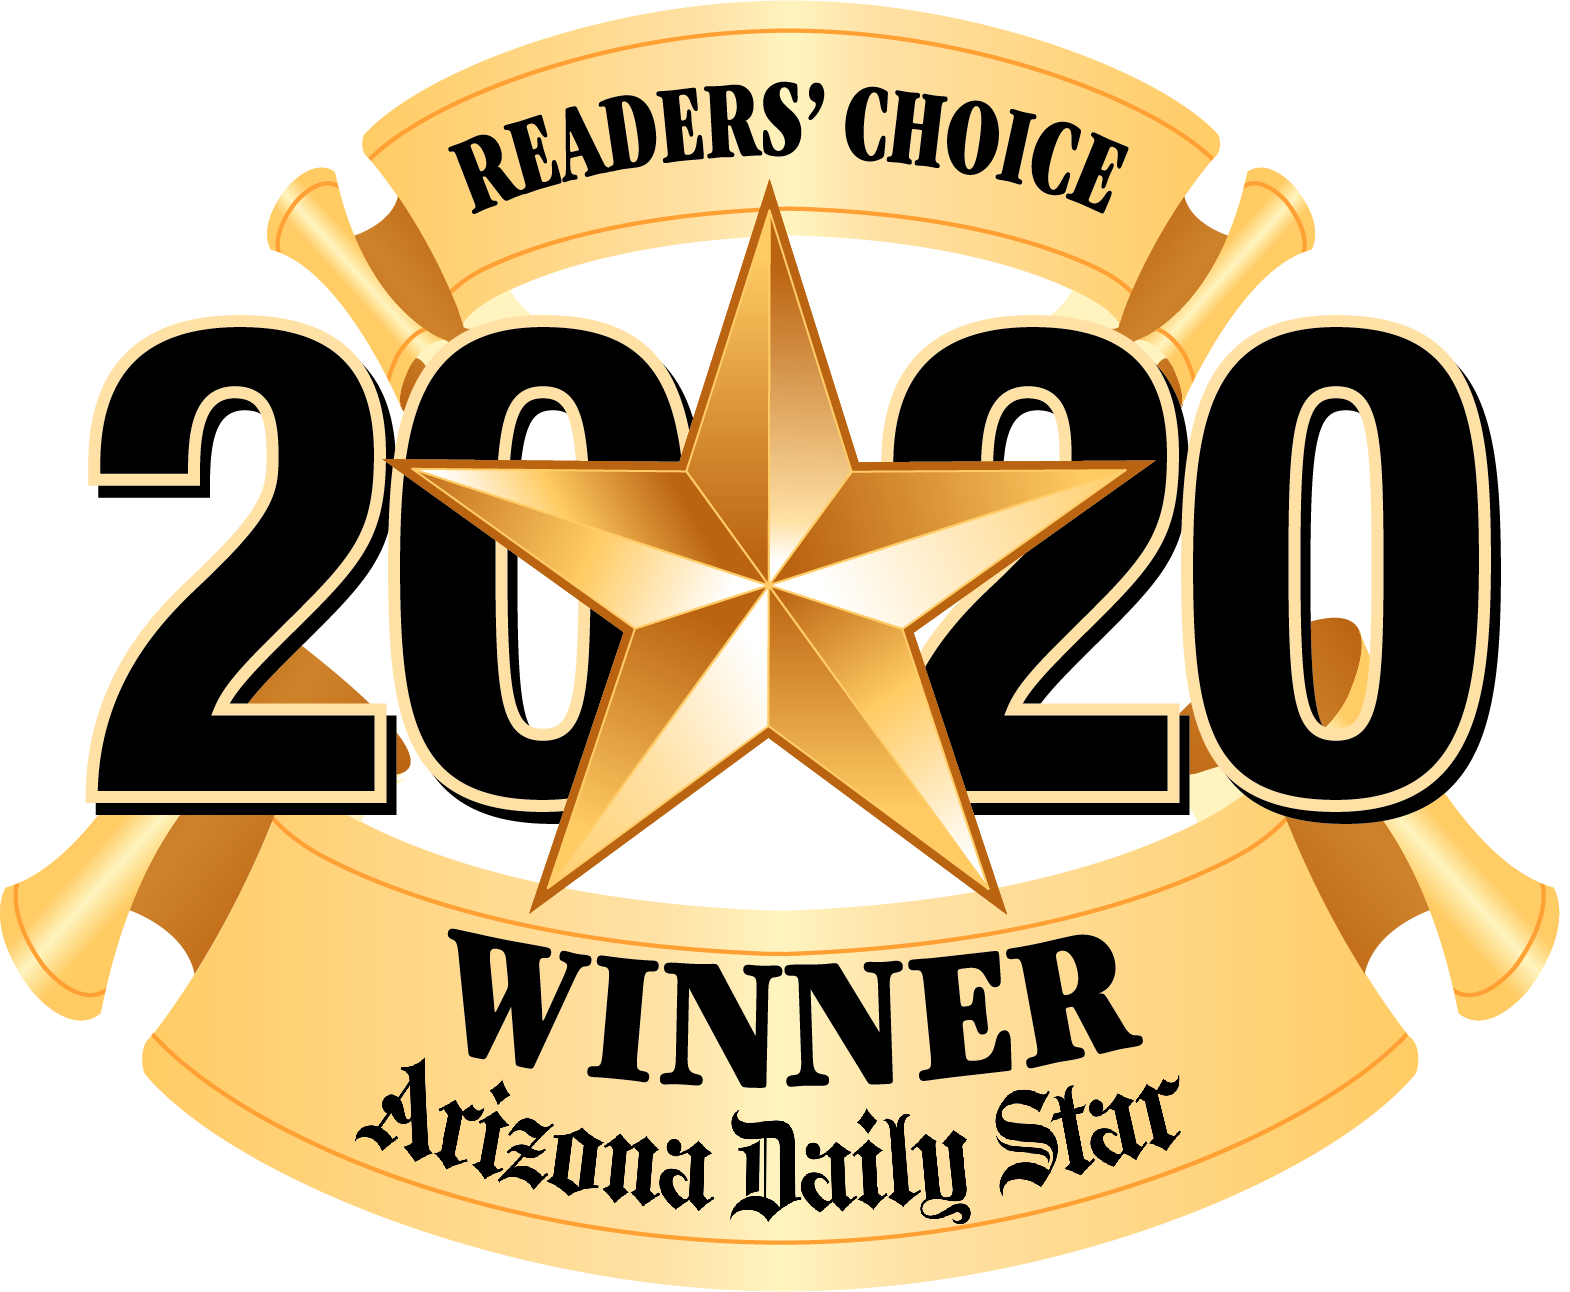 2020 Readers Choice Winner logo